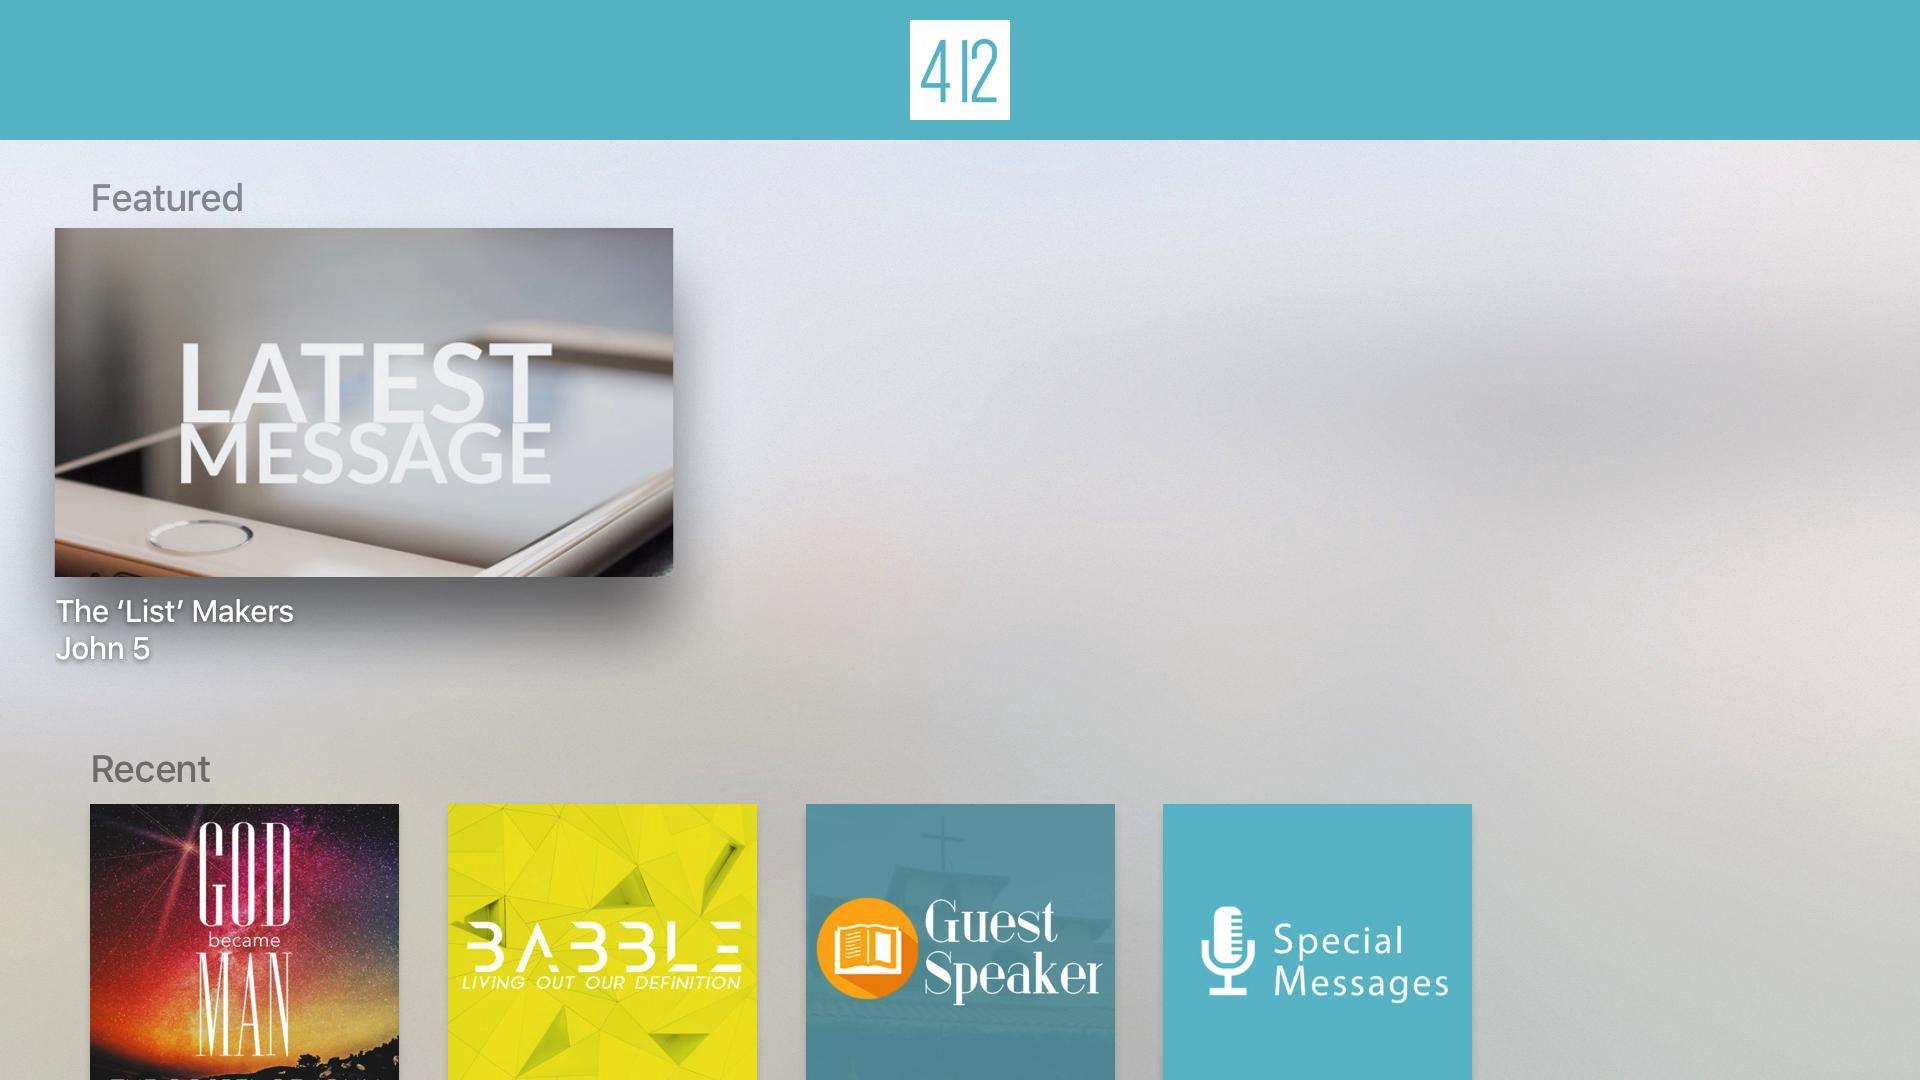 App - 412 Church